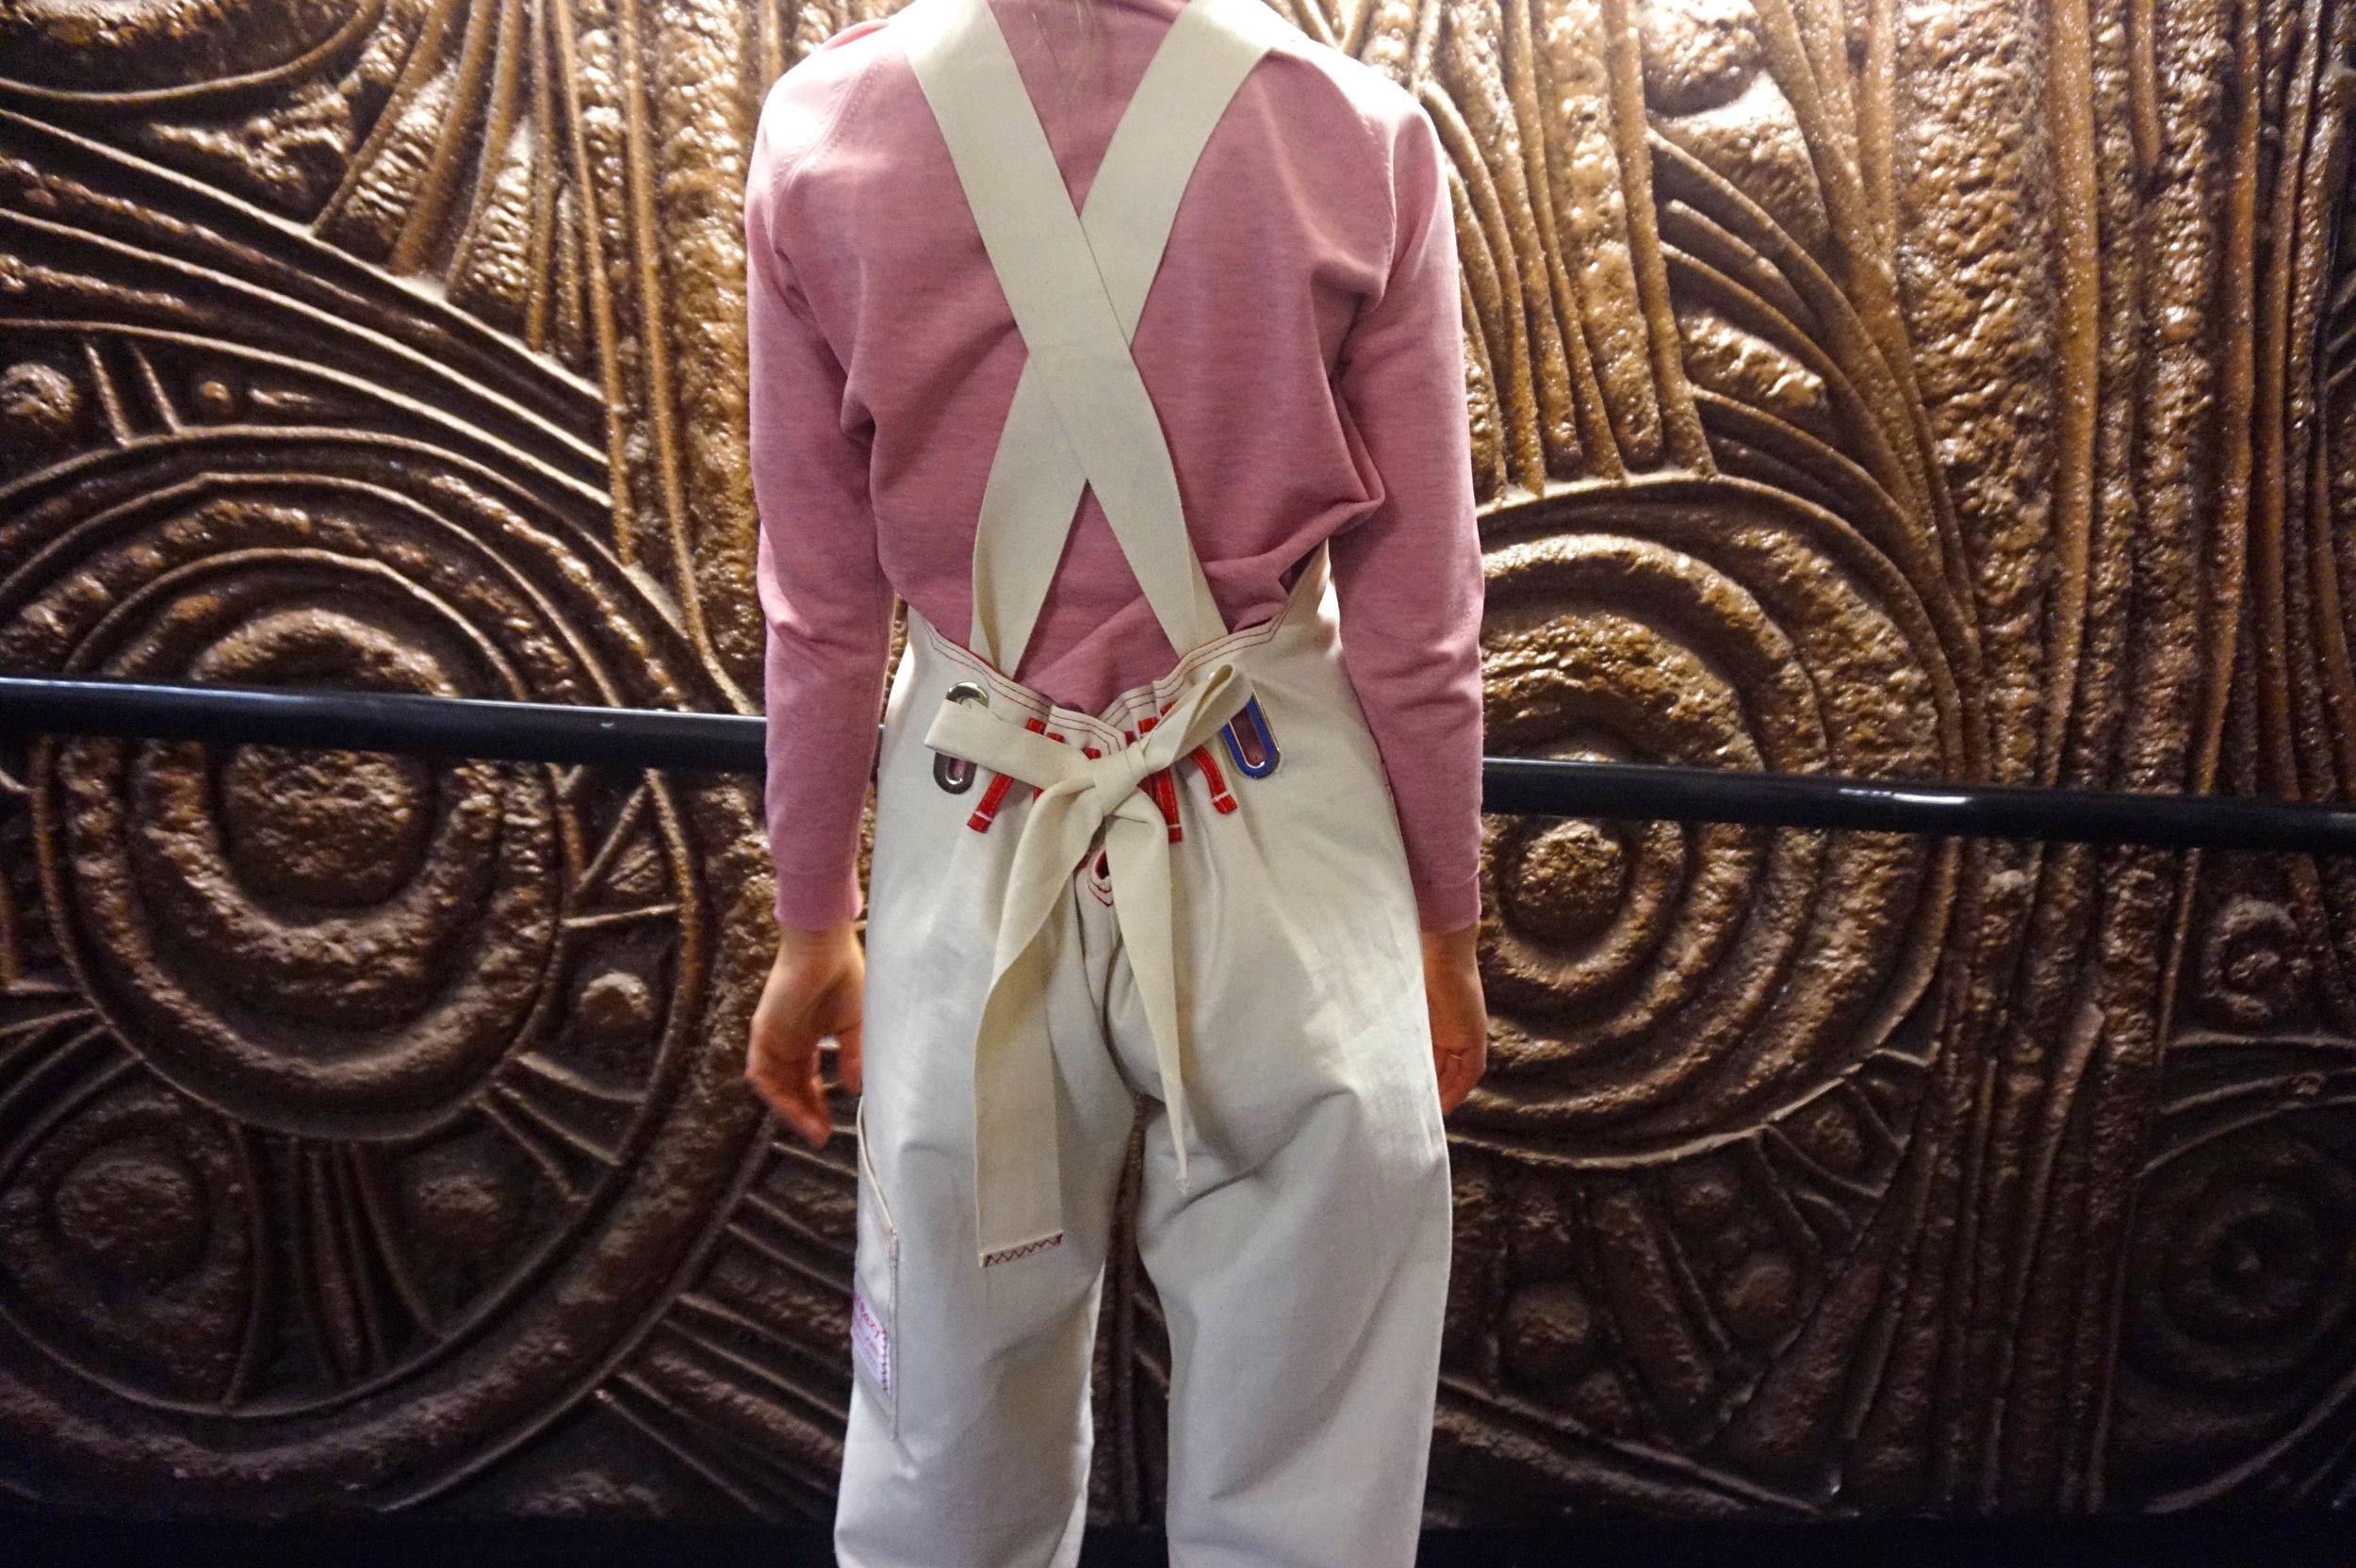 PeelEezy_TheShowroom_Uniform4.jpg